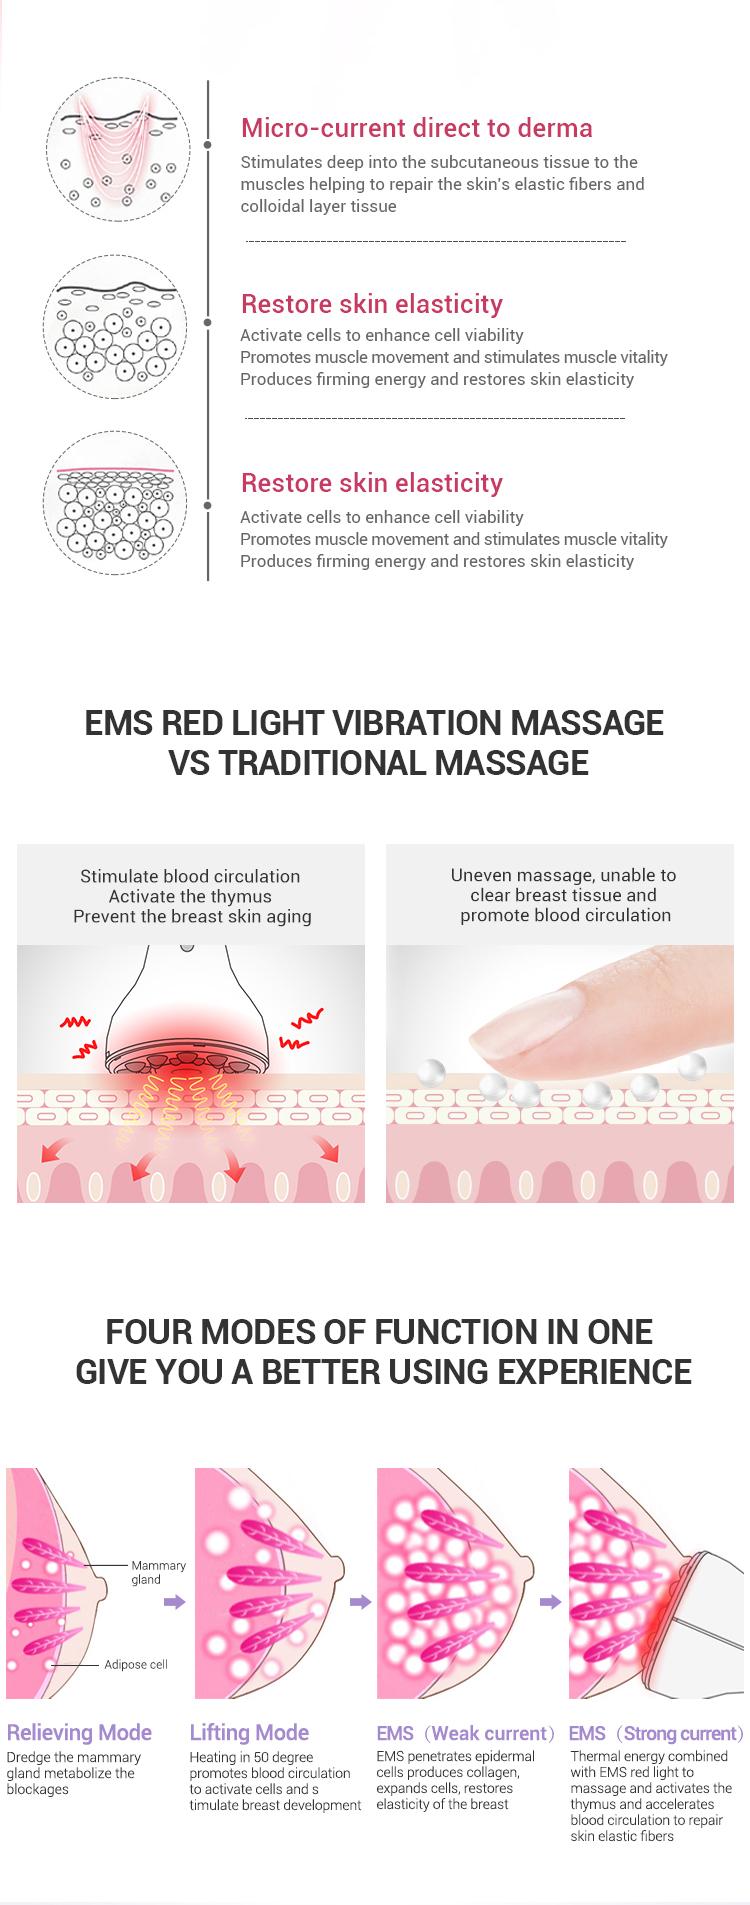 EMS 電気ポータブル十ユニット本体マッサージ機筋肉刺激装置